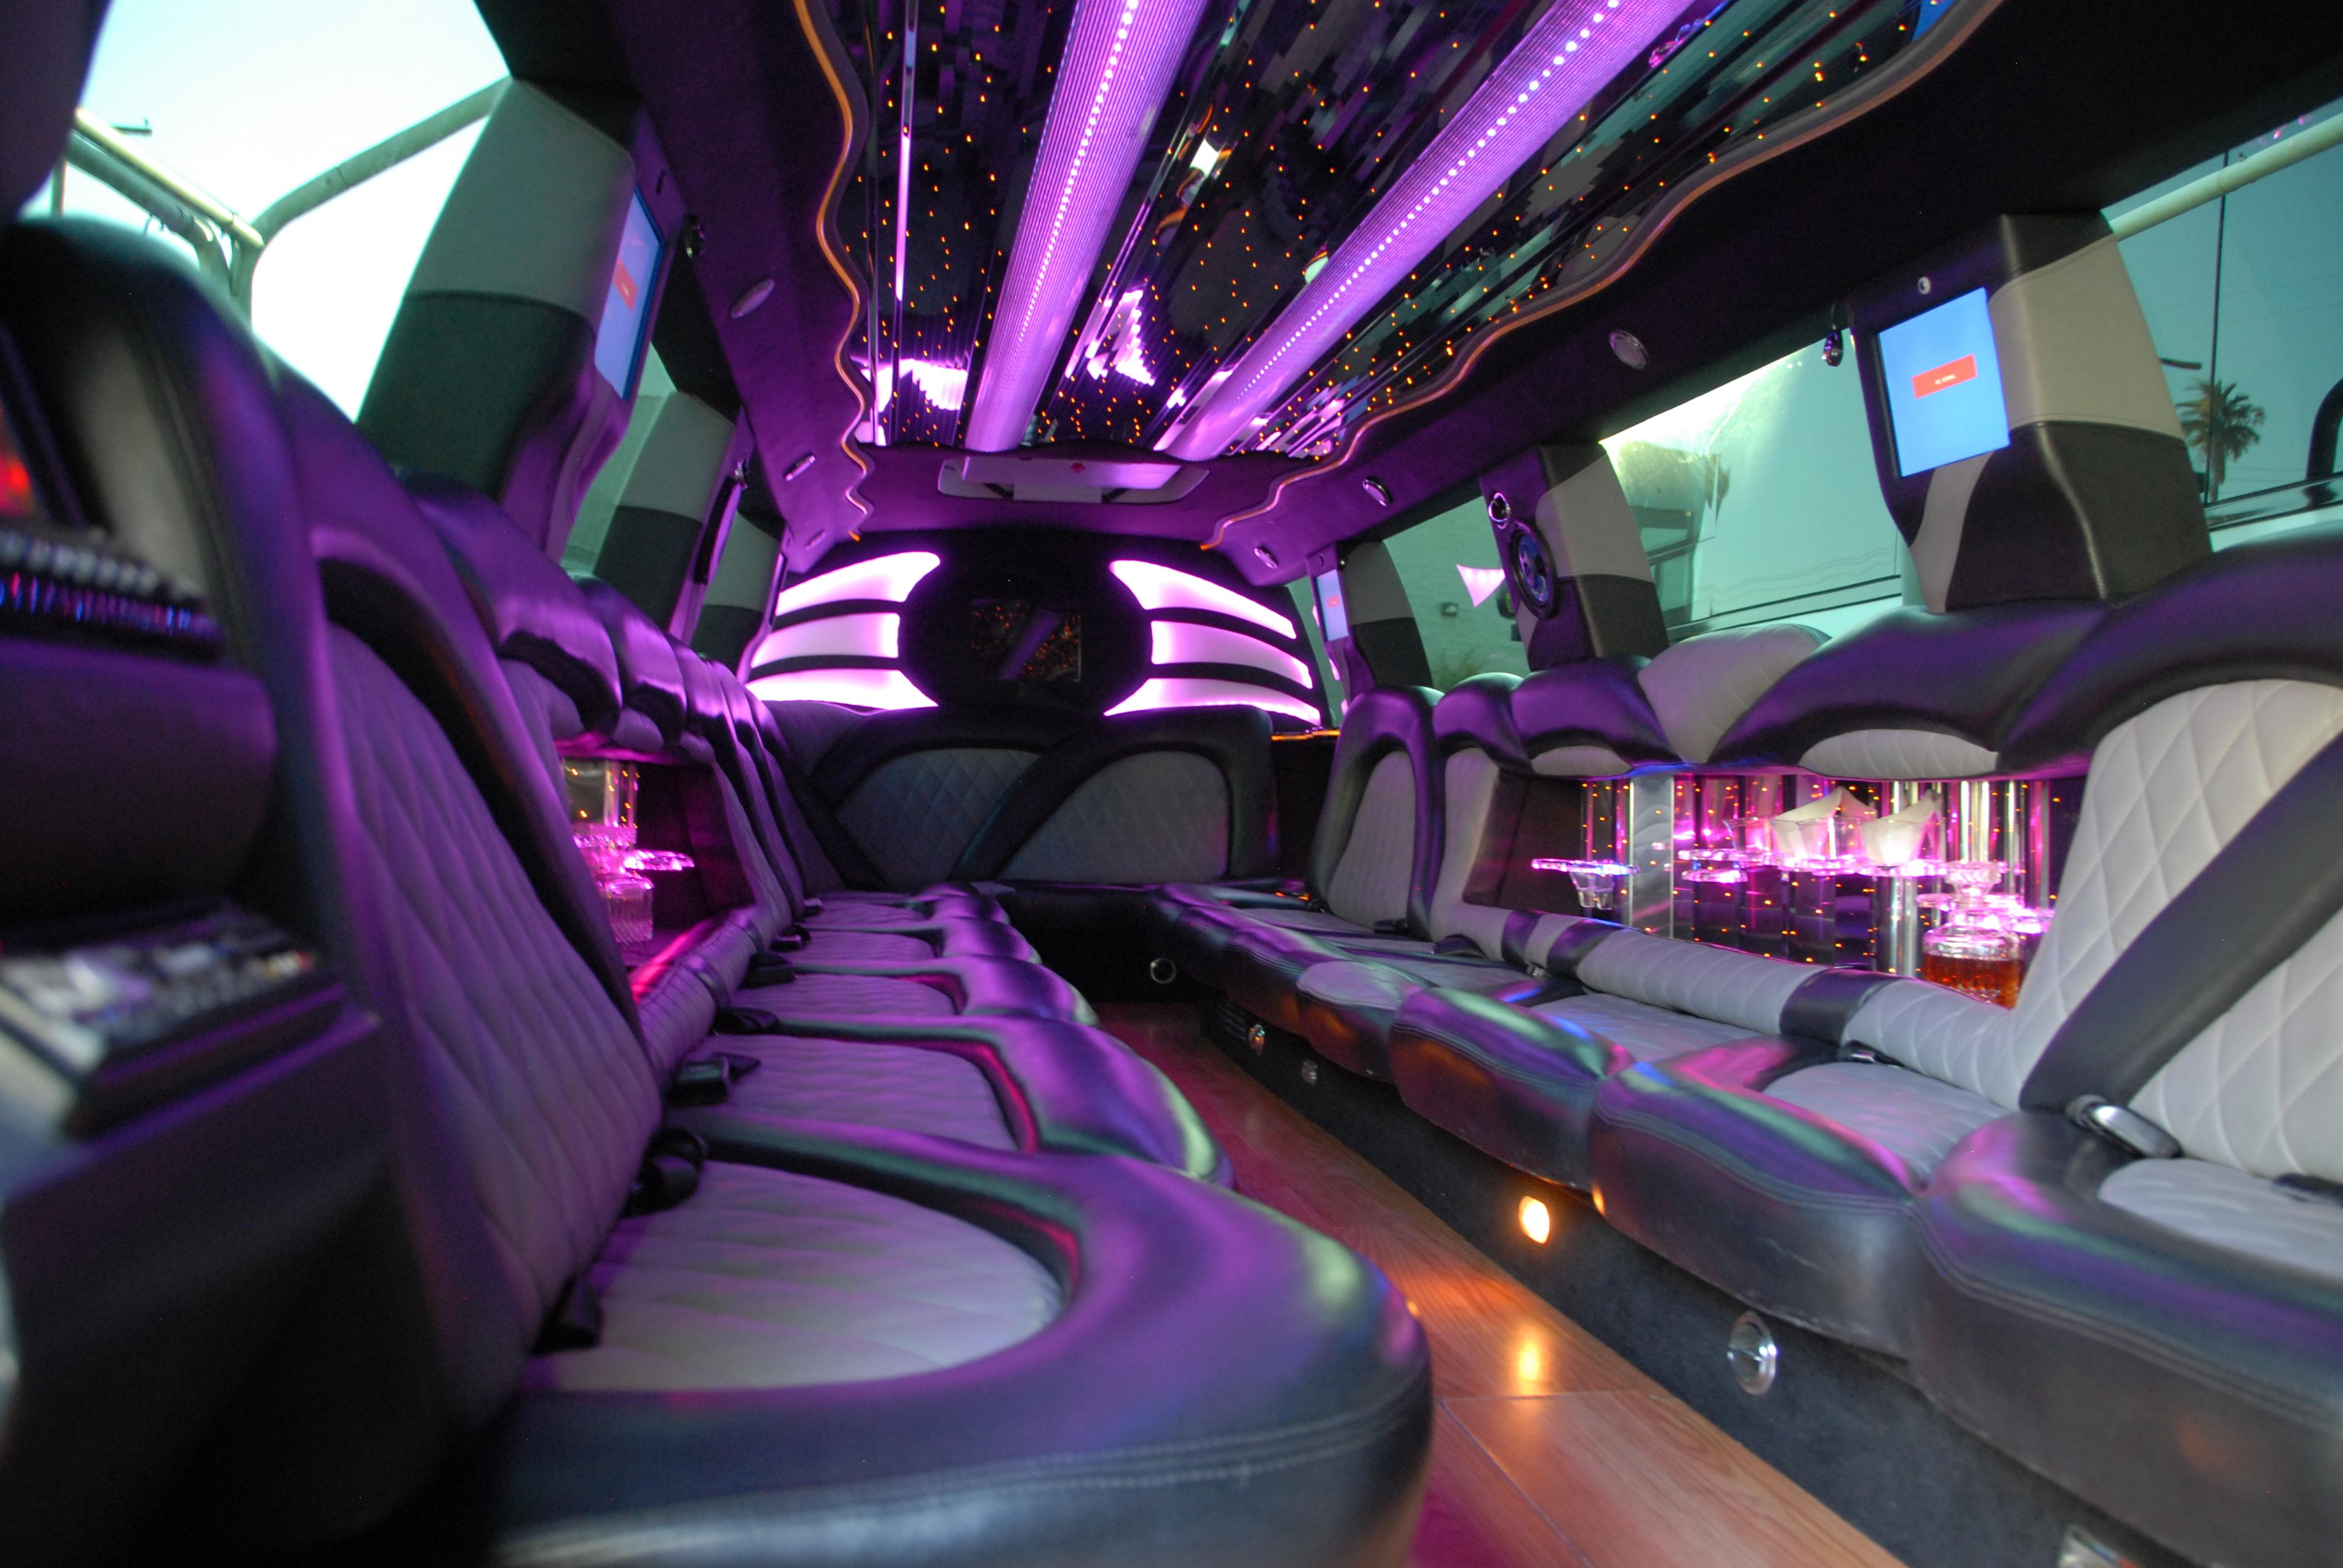 dallas limo service dallas party bus rental. Black Bedroom Furniture Sets. Home Design Ideas